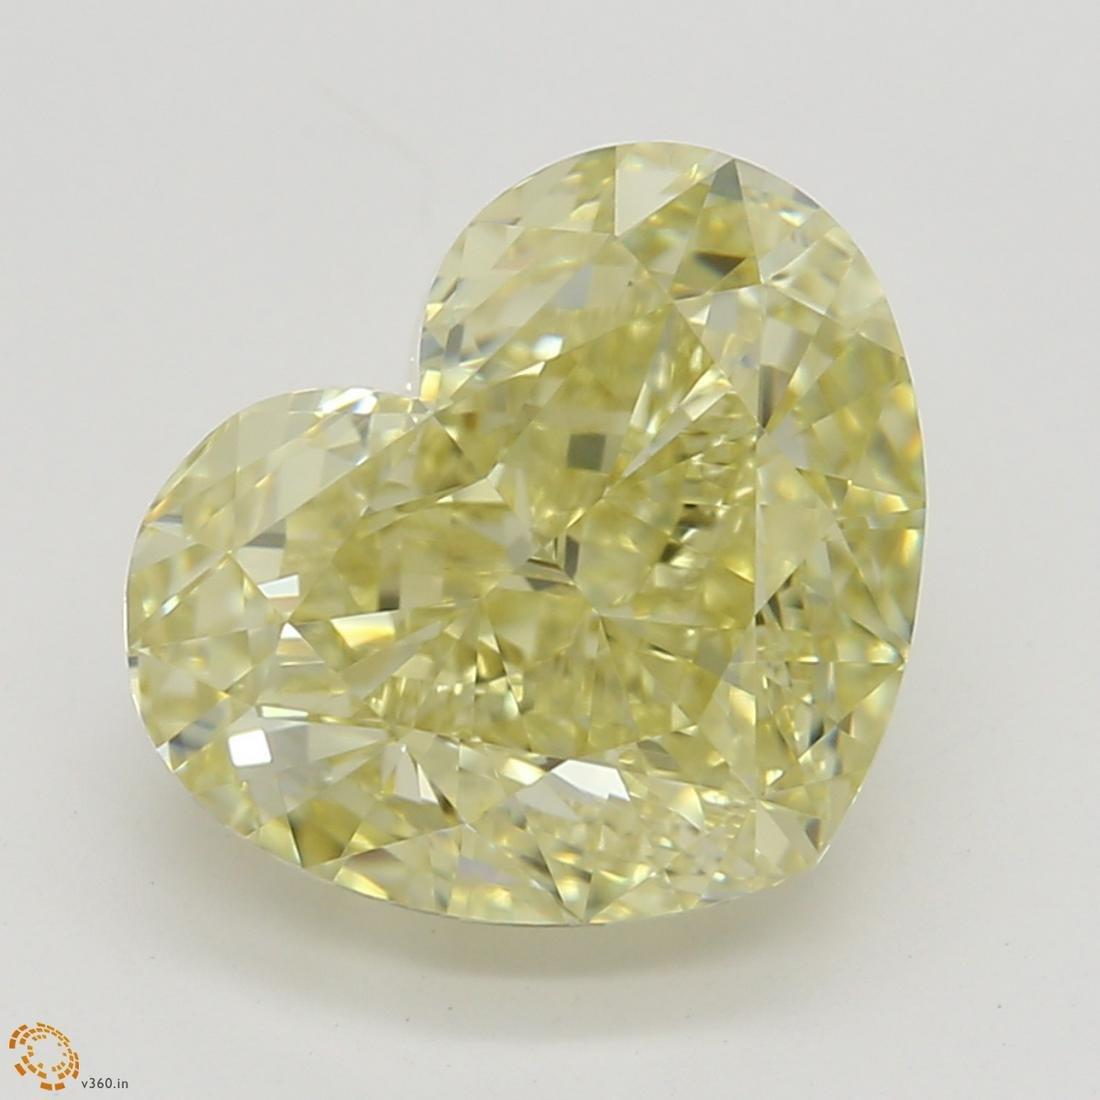 2.51 ct, Brown Yellow/VVS2, Heart cut Diamond